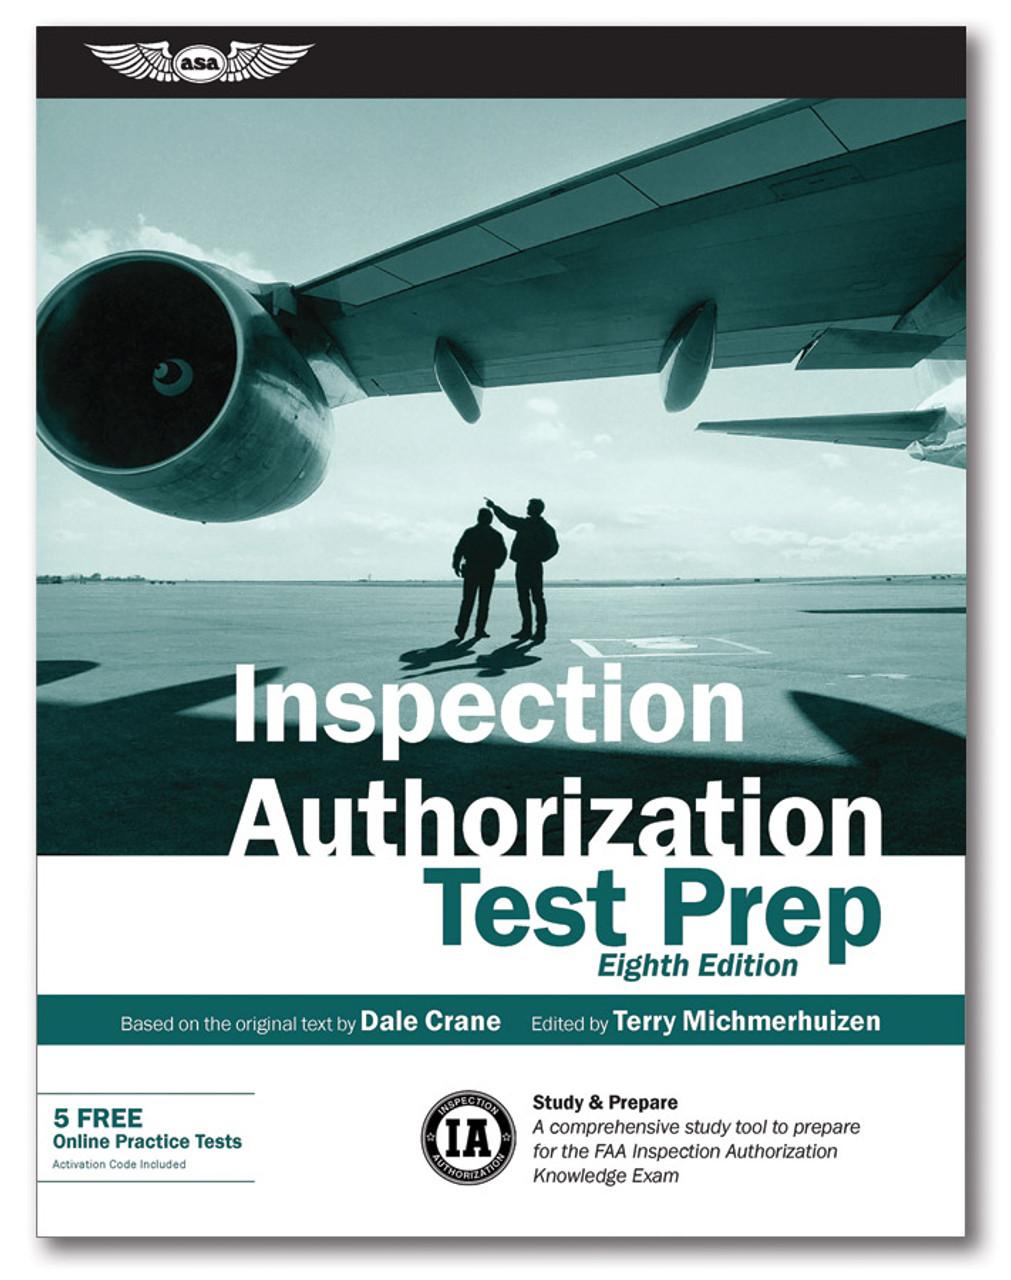 ASA Inspection Authorization Test Prep - Eighth Edition